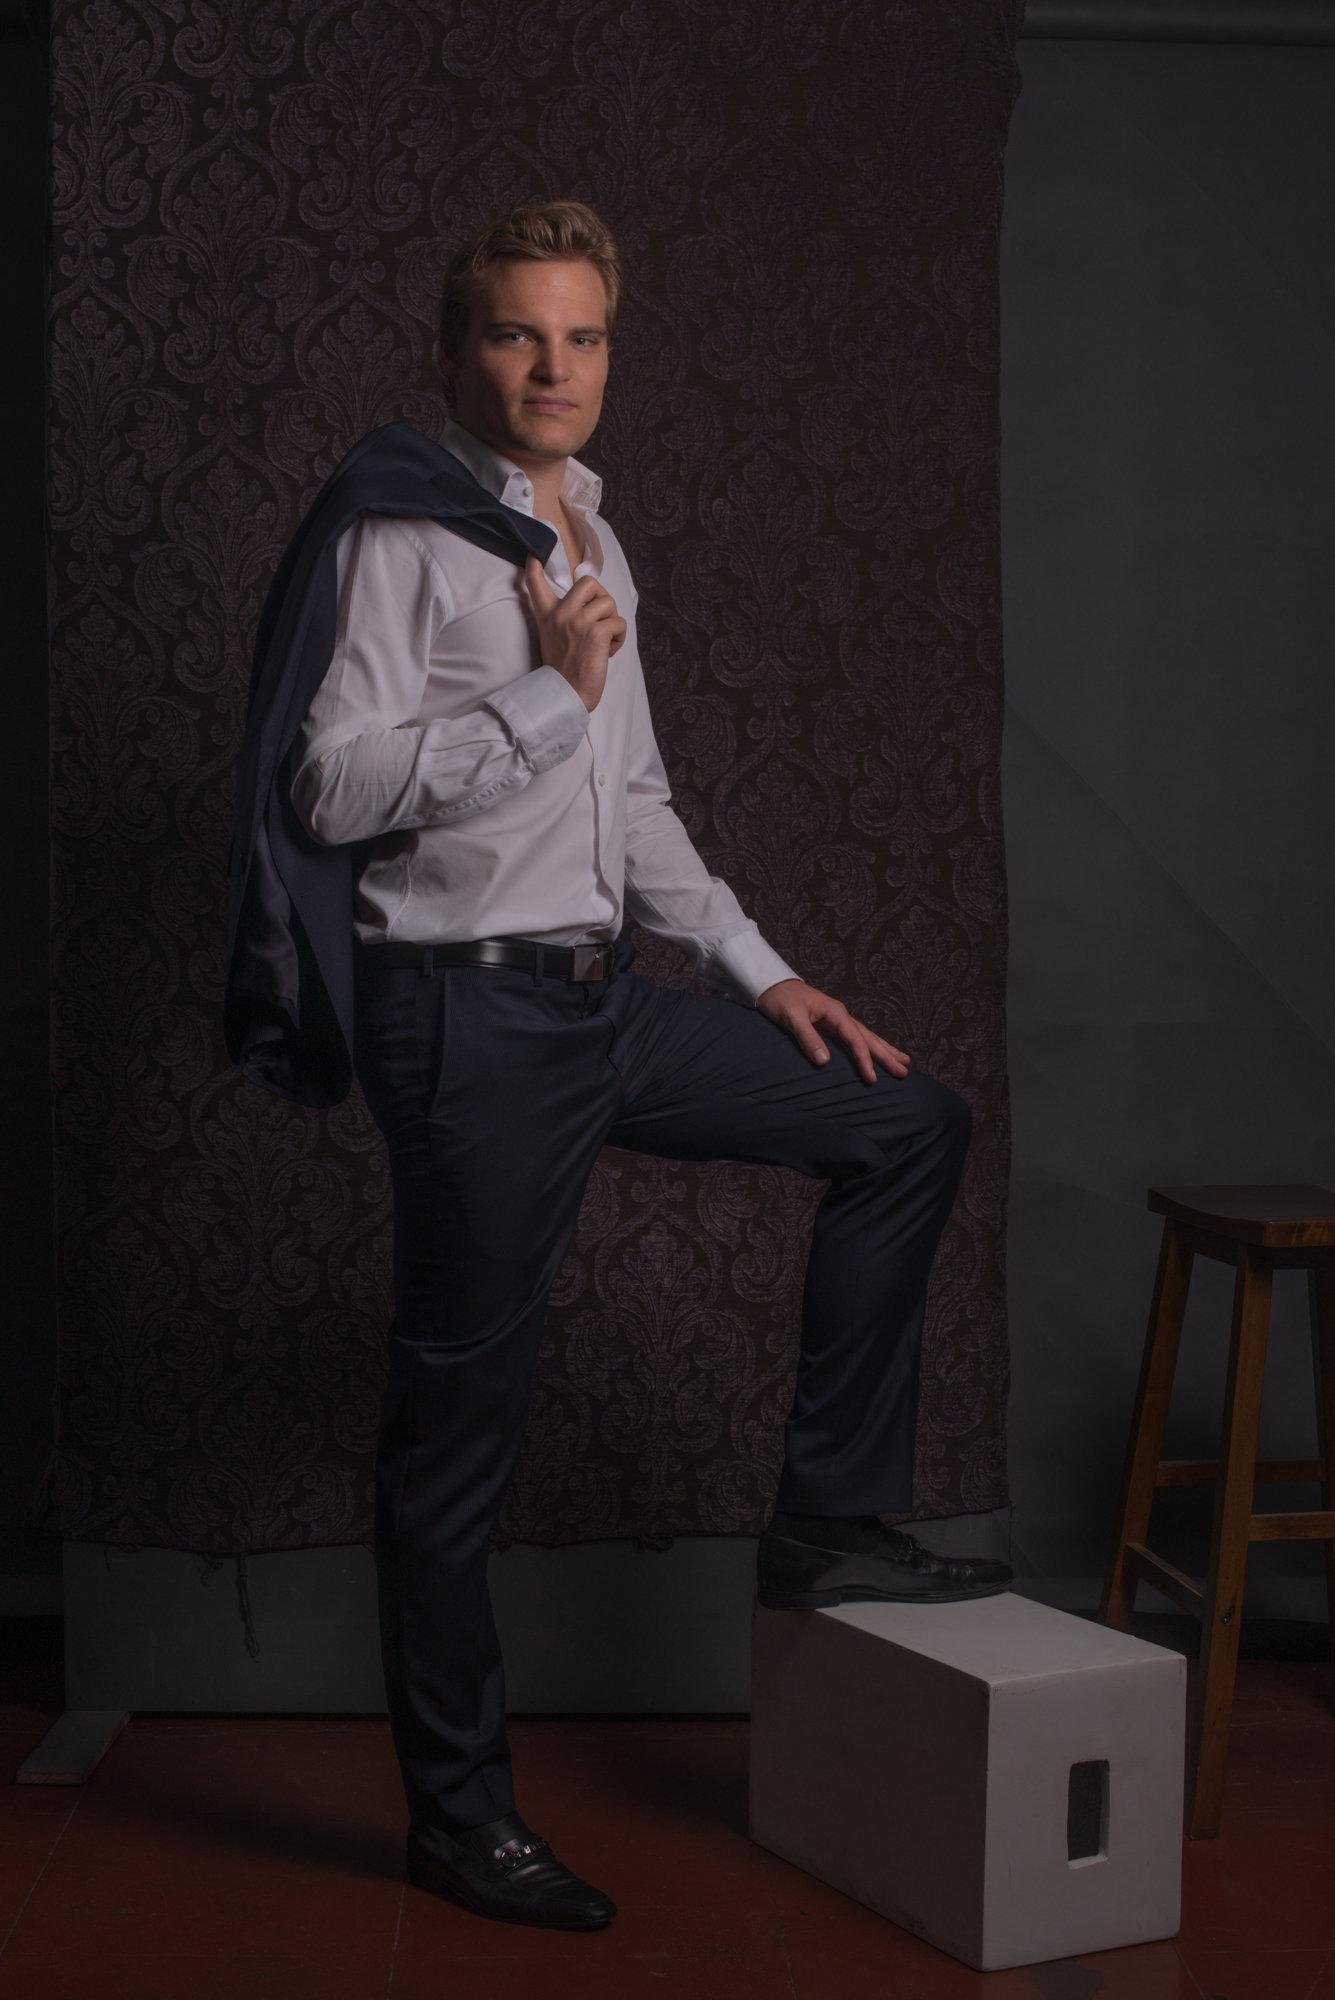 patrick-rivera-portrait-photographer-jorrit-koop-patrickrivera (3 of 9).jpg